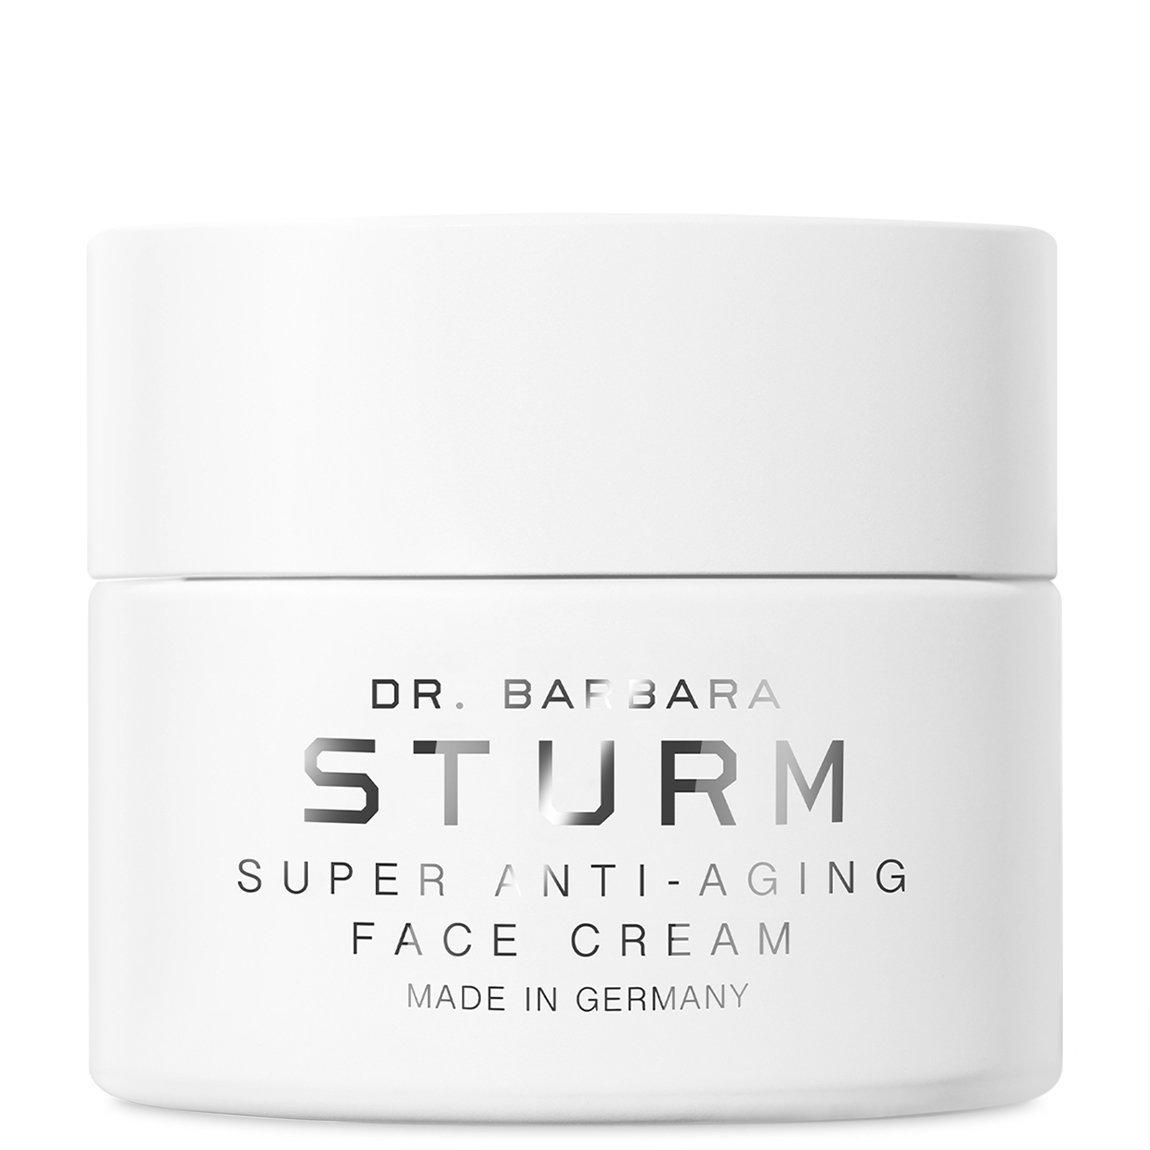 Dr. Barbara Sturm Super Anti-Aging Face Cream alternative view 1 - product swatch.